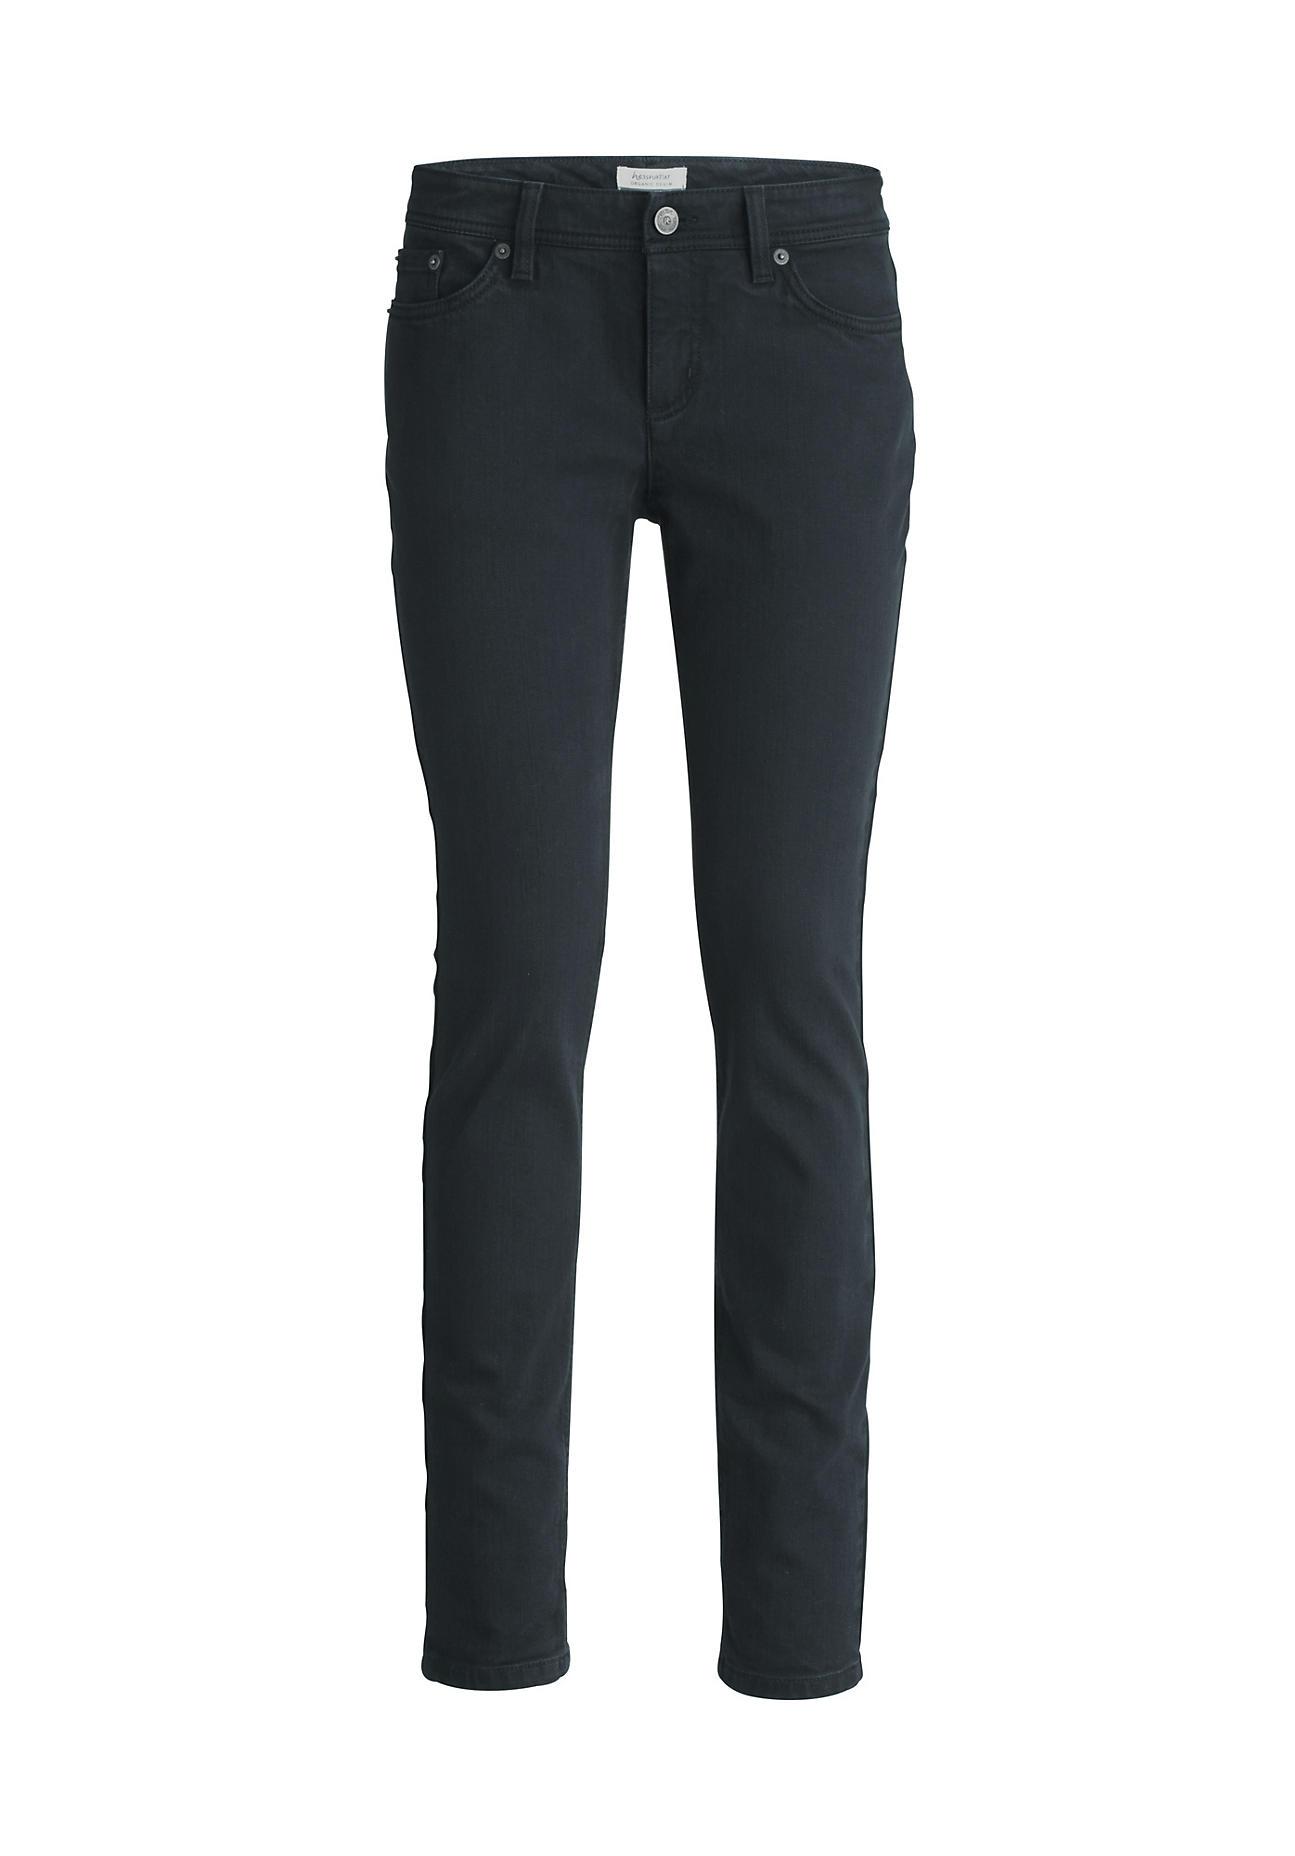 - https://imgs7.hessnatur.com/is/image/HessNatur/generalfeed_large/Jeans_Slim_Fit_aus_Bio_Baumwolle-49618_34_7.jpg